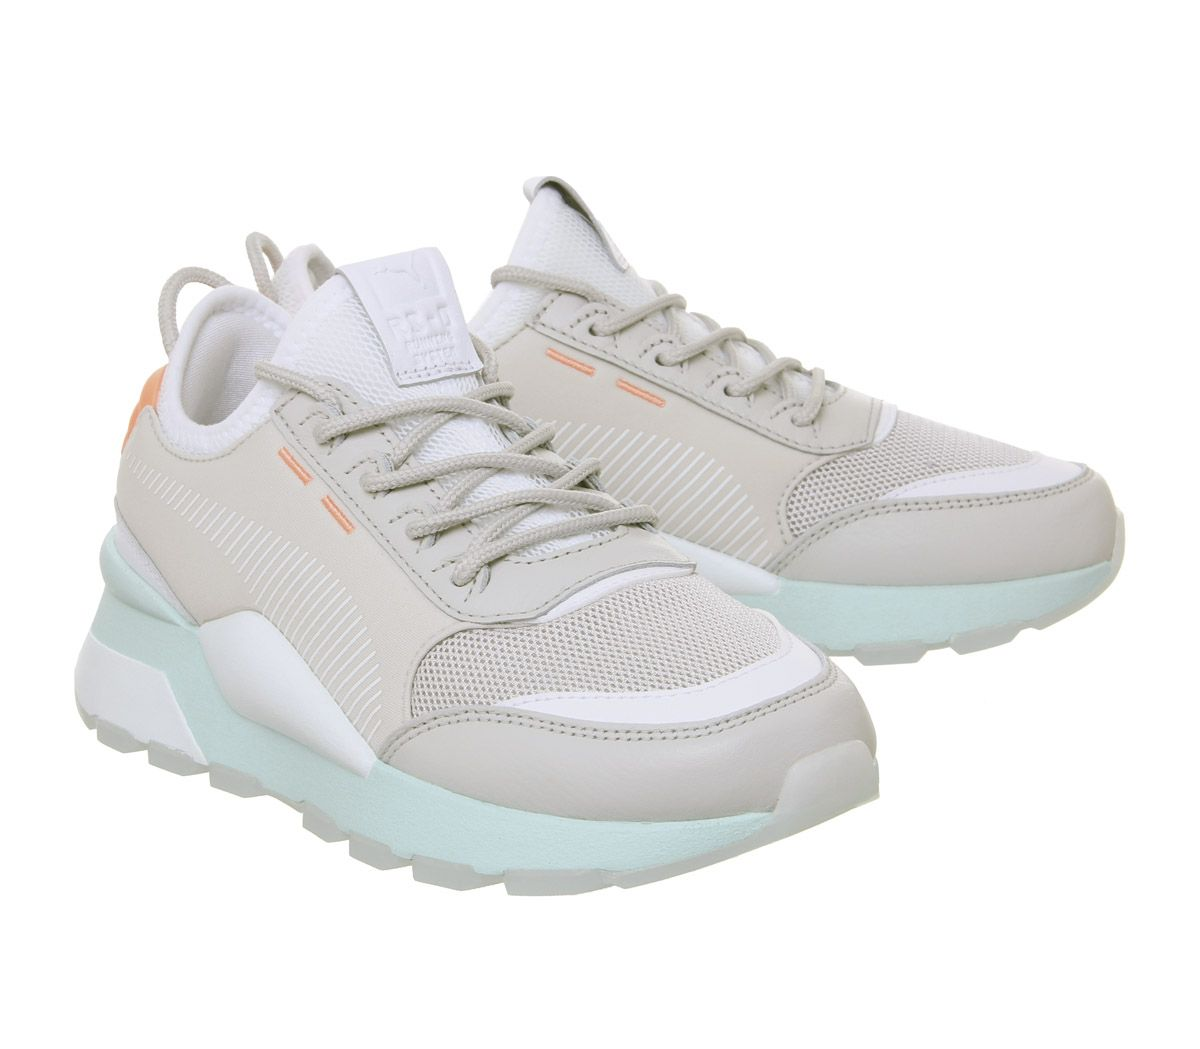 puma grises mujer zapatillas